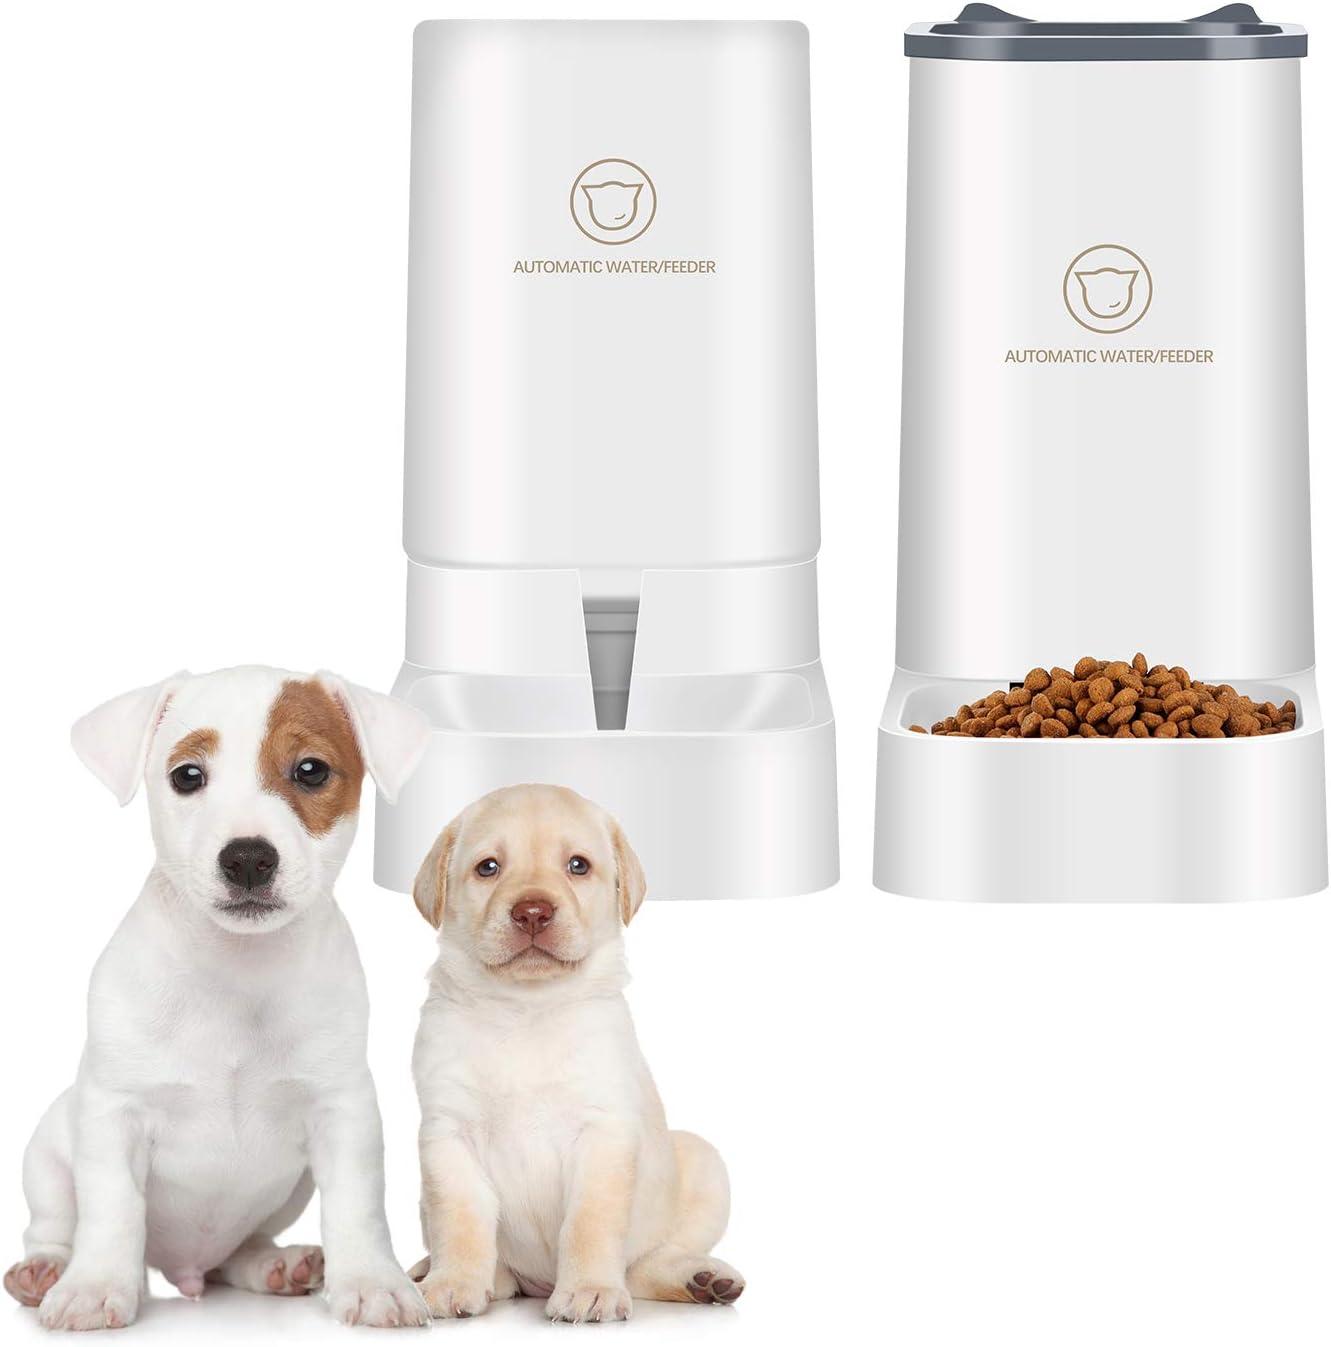 beyonday 2PCS Dog Cat Automatic Feeder 3.8L Water Dispenser Pet Feeder Set, Auto Gravity Water and Food Dispenser, Auto Feeder Self Feeding for Small Medium Cat Dog